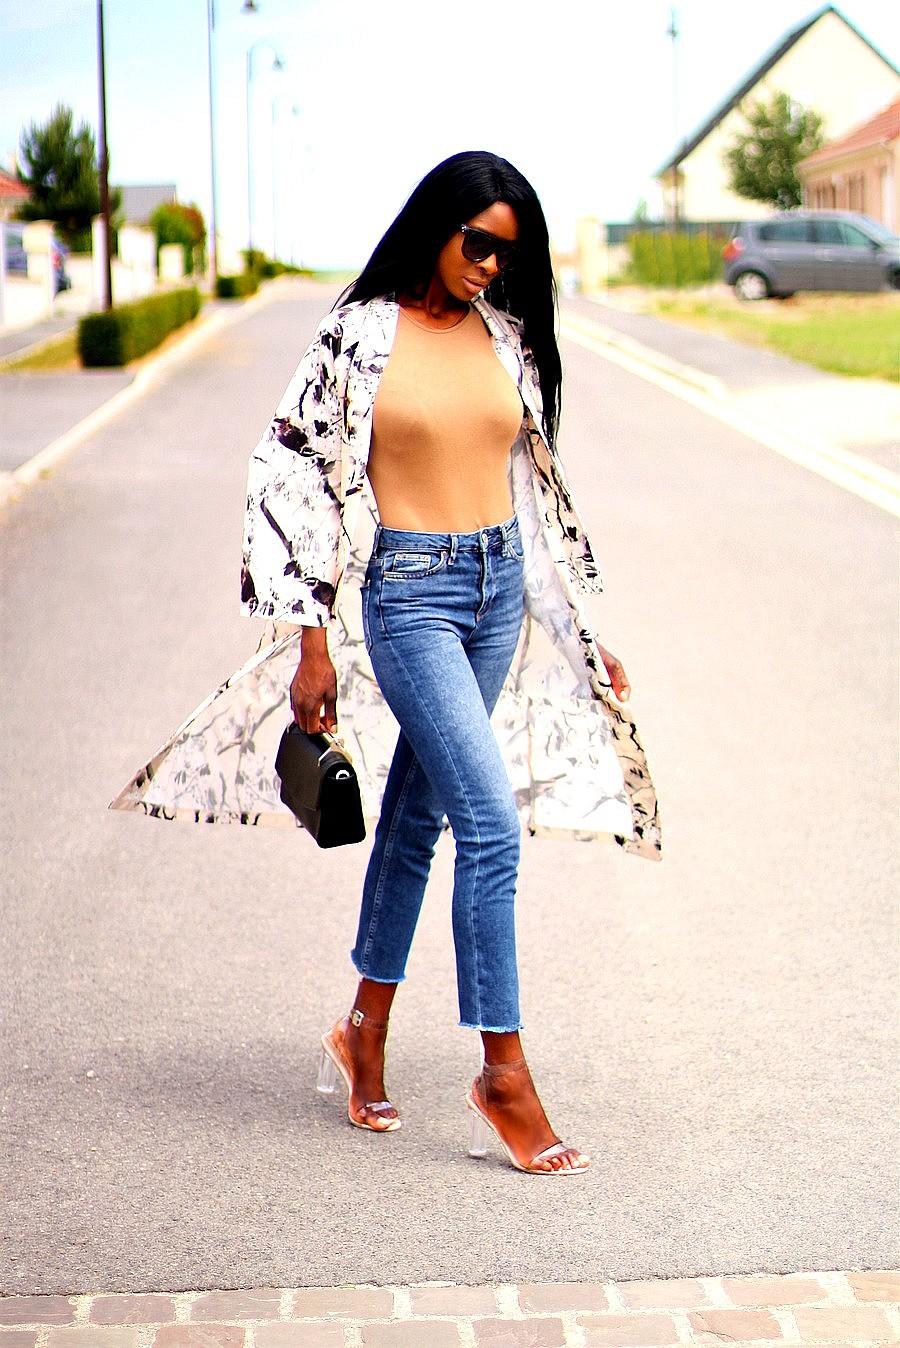 comment-porter-le-kimono-tendance-blog-instagram